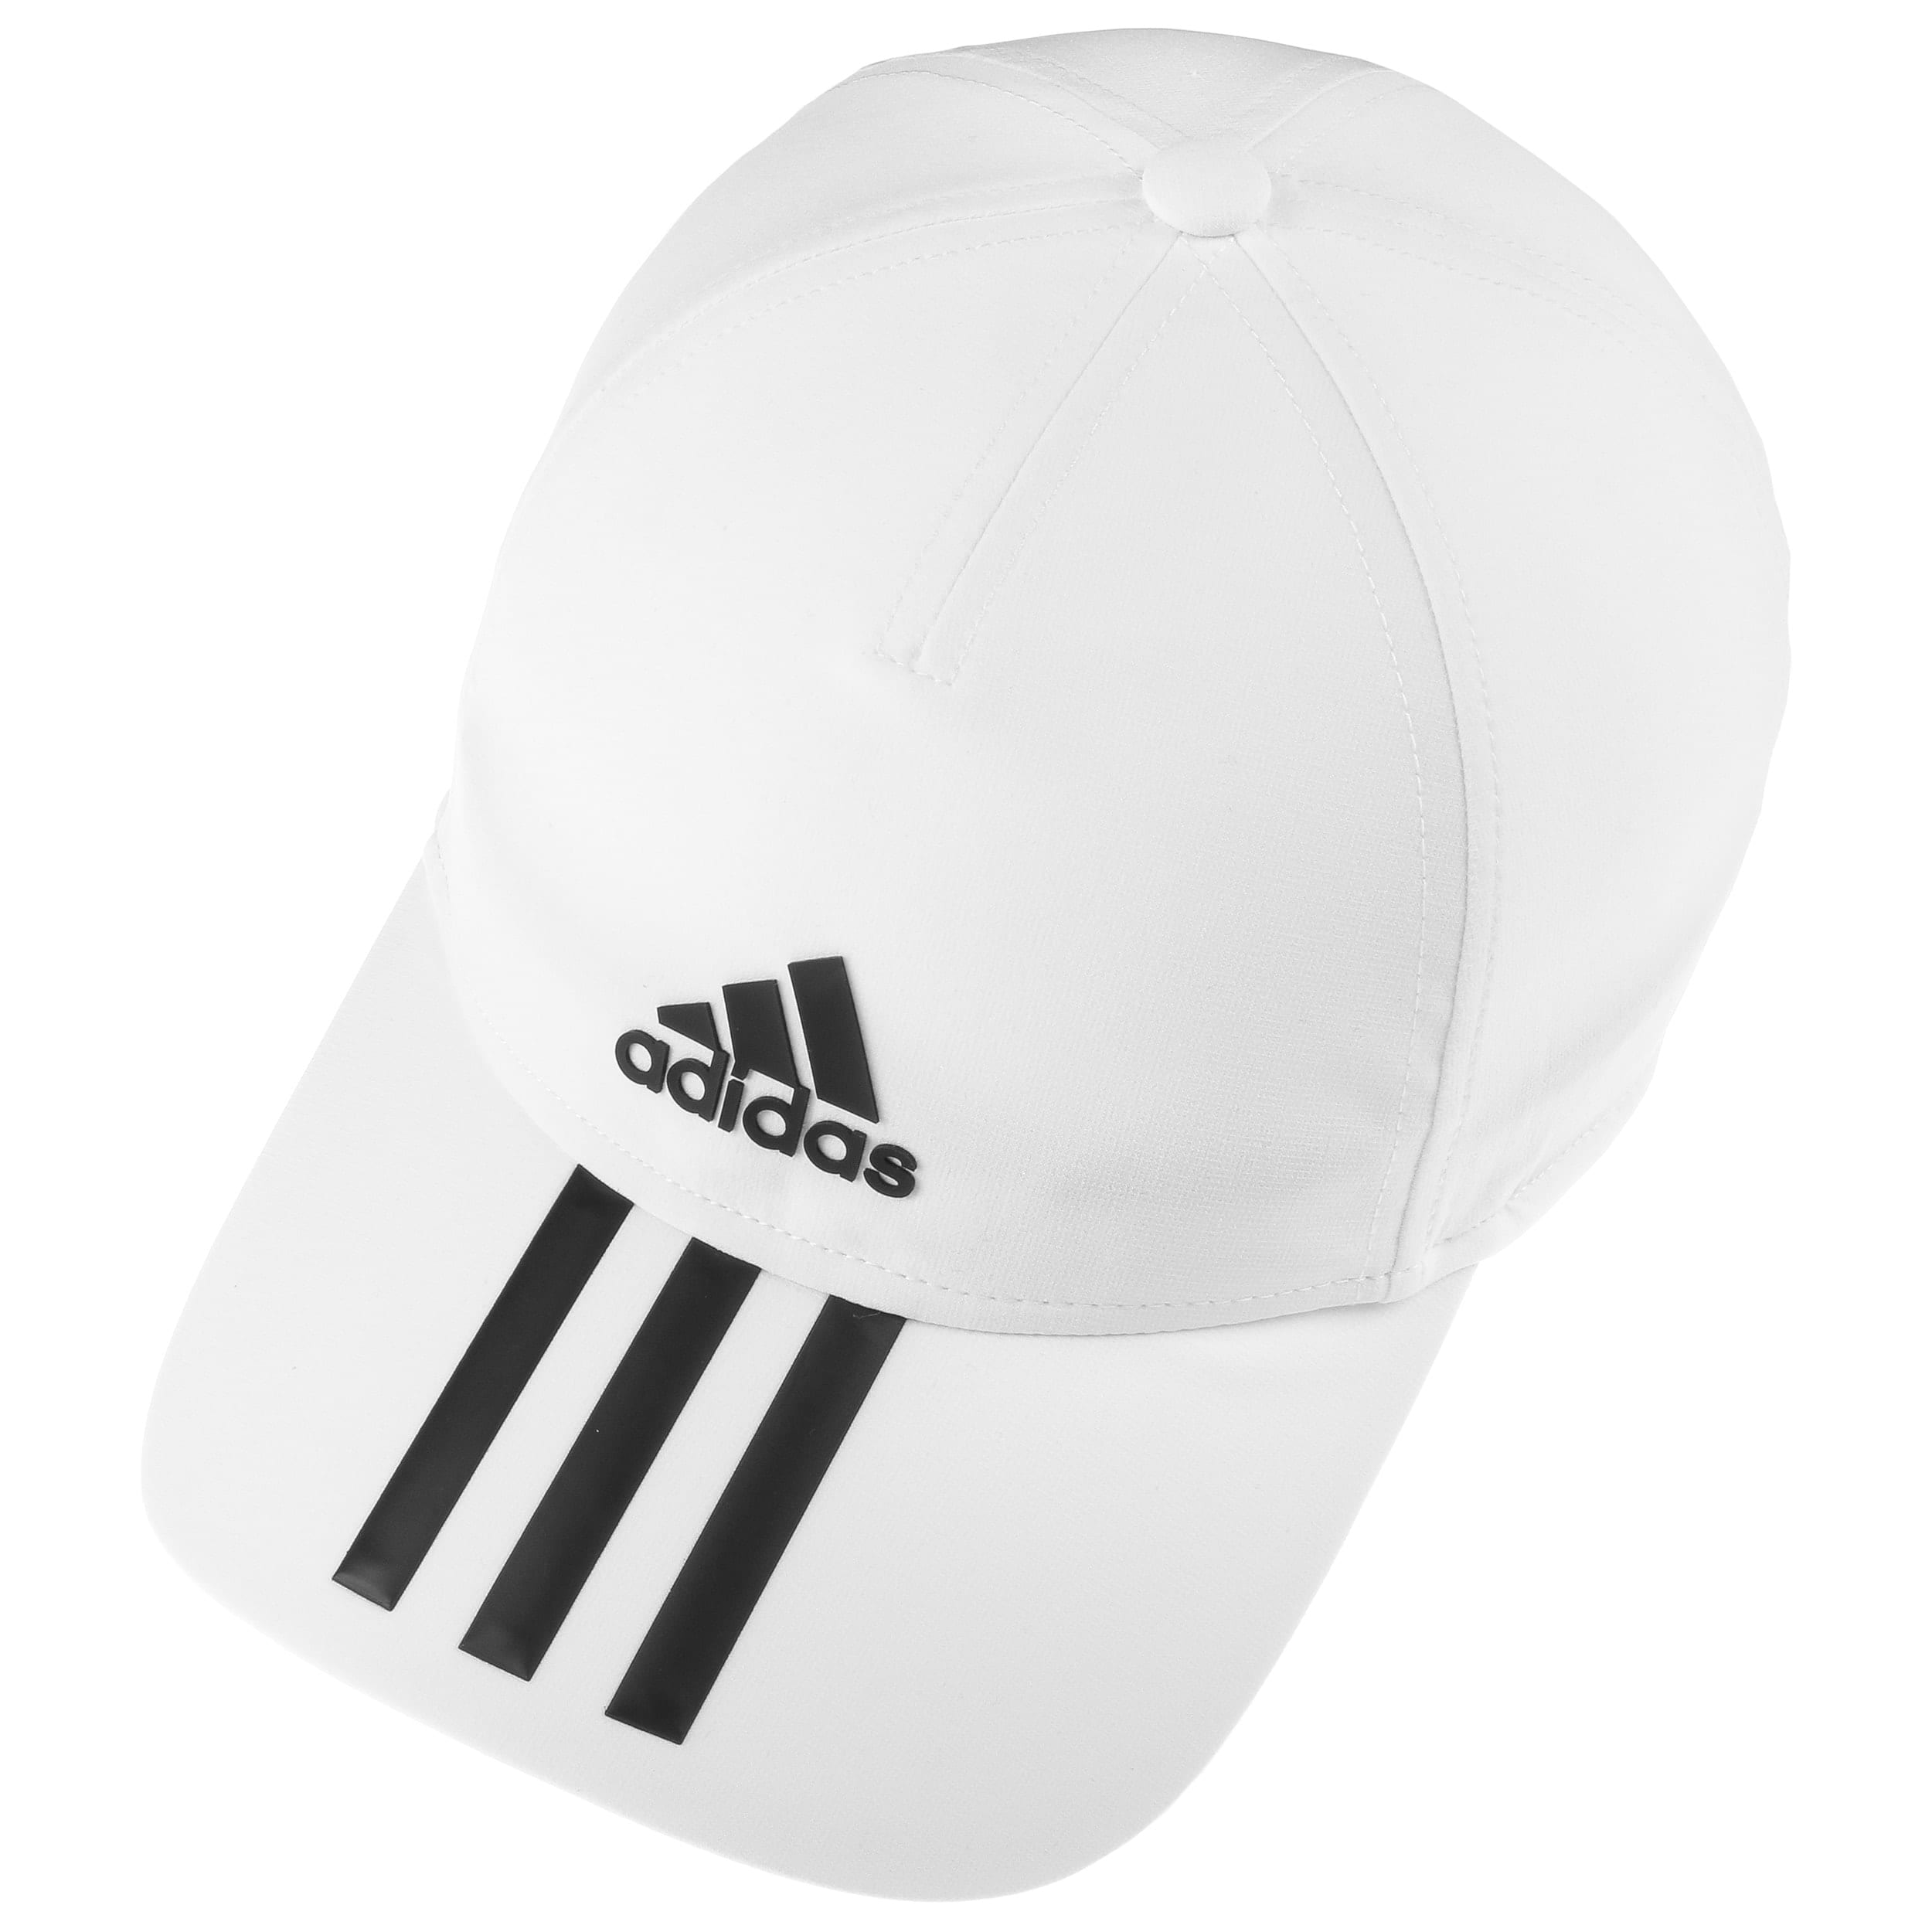 f182ea35d9ac ... black 1 · C40 6P 3S Climalite Cap by adidas - white 1 ...